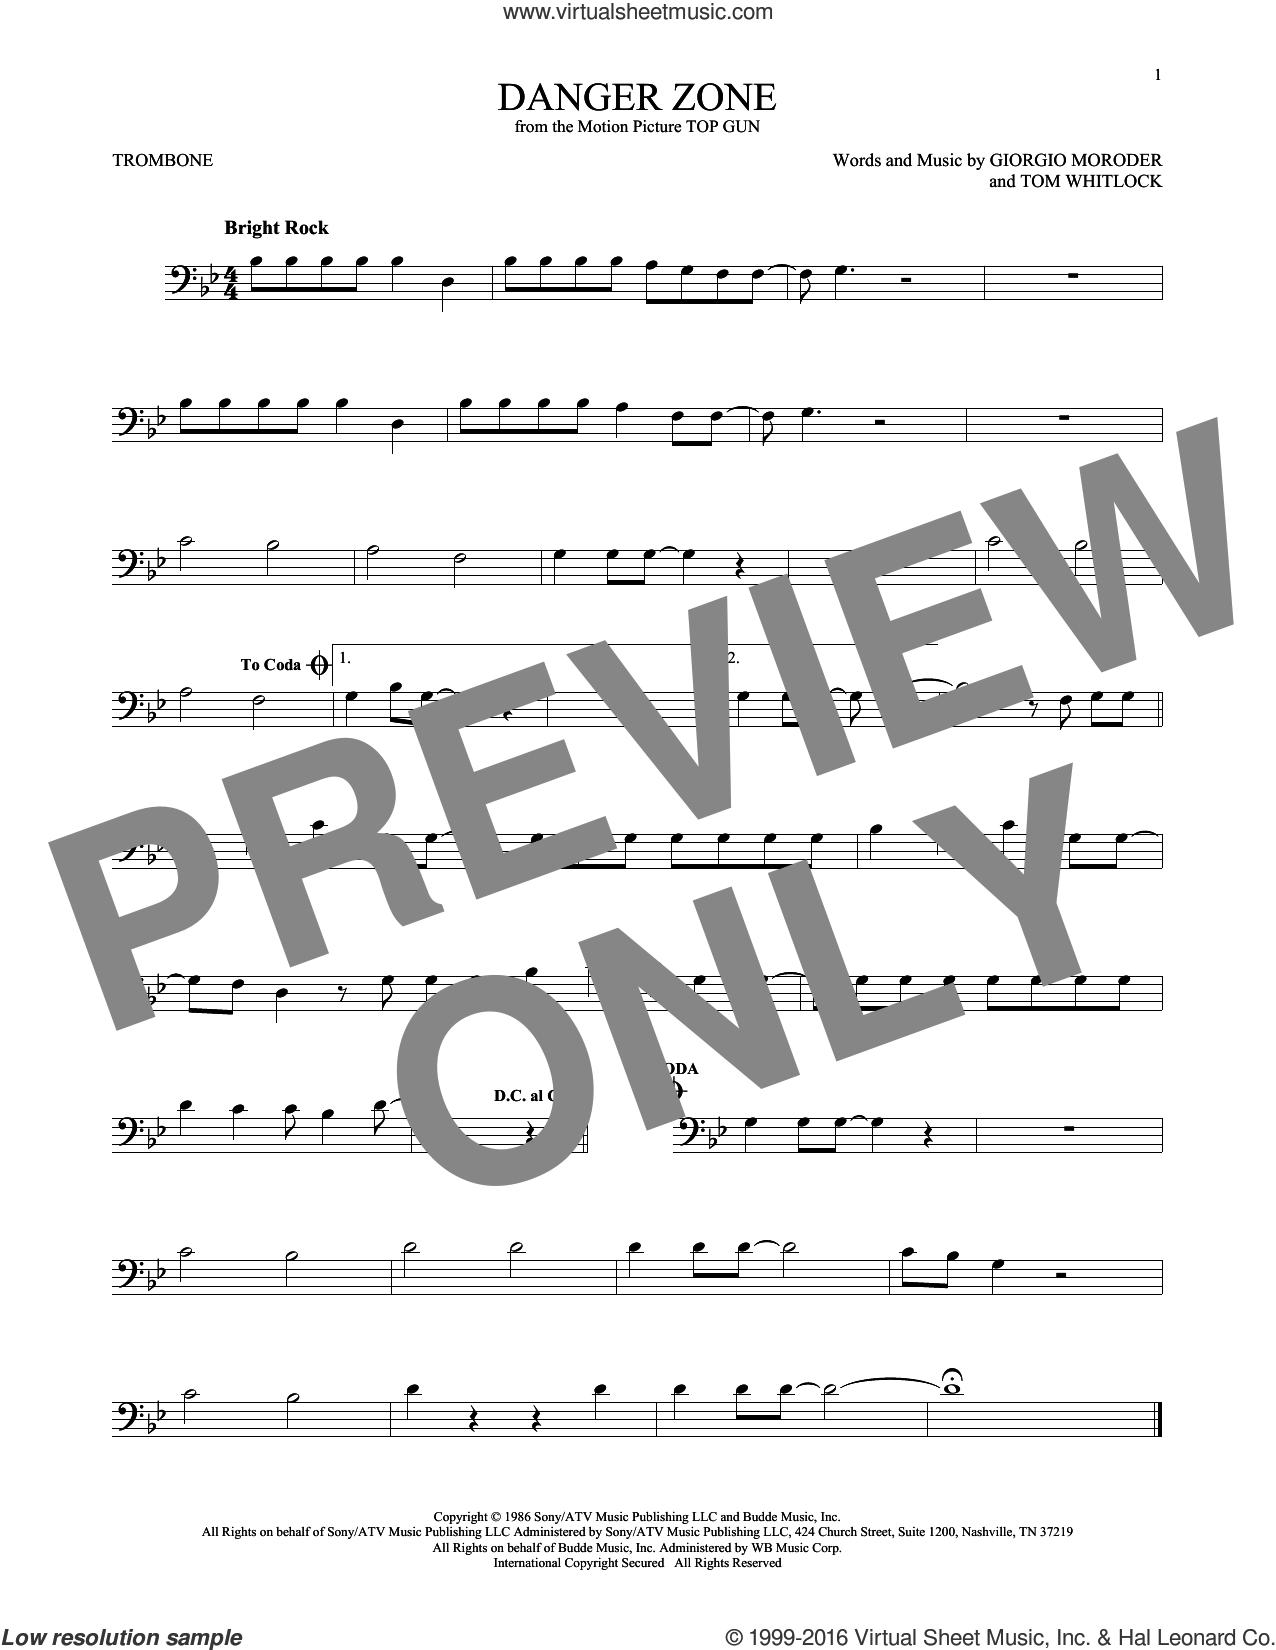 Danger Zone sheet music for trombone solo by Kenny Loggins, Giorgio Moroder and Tom Whitlock, intermediate skill level